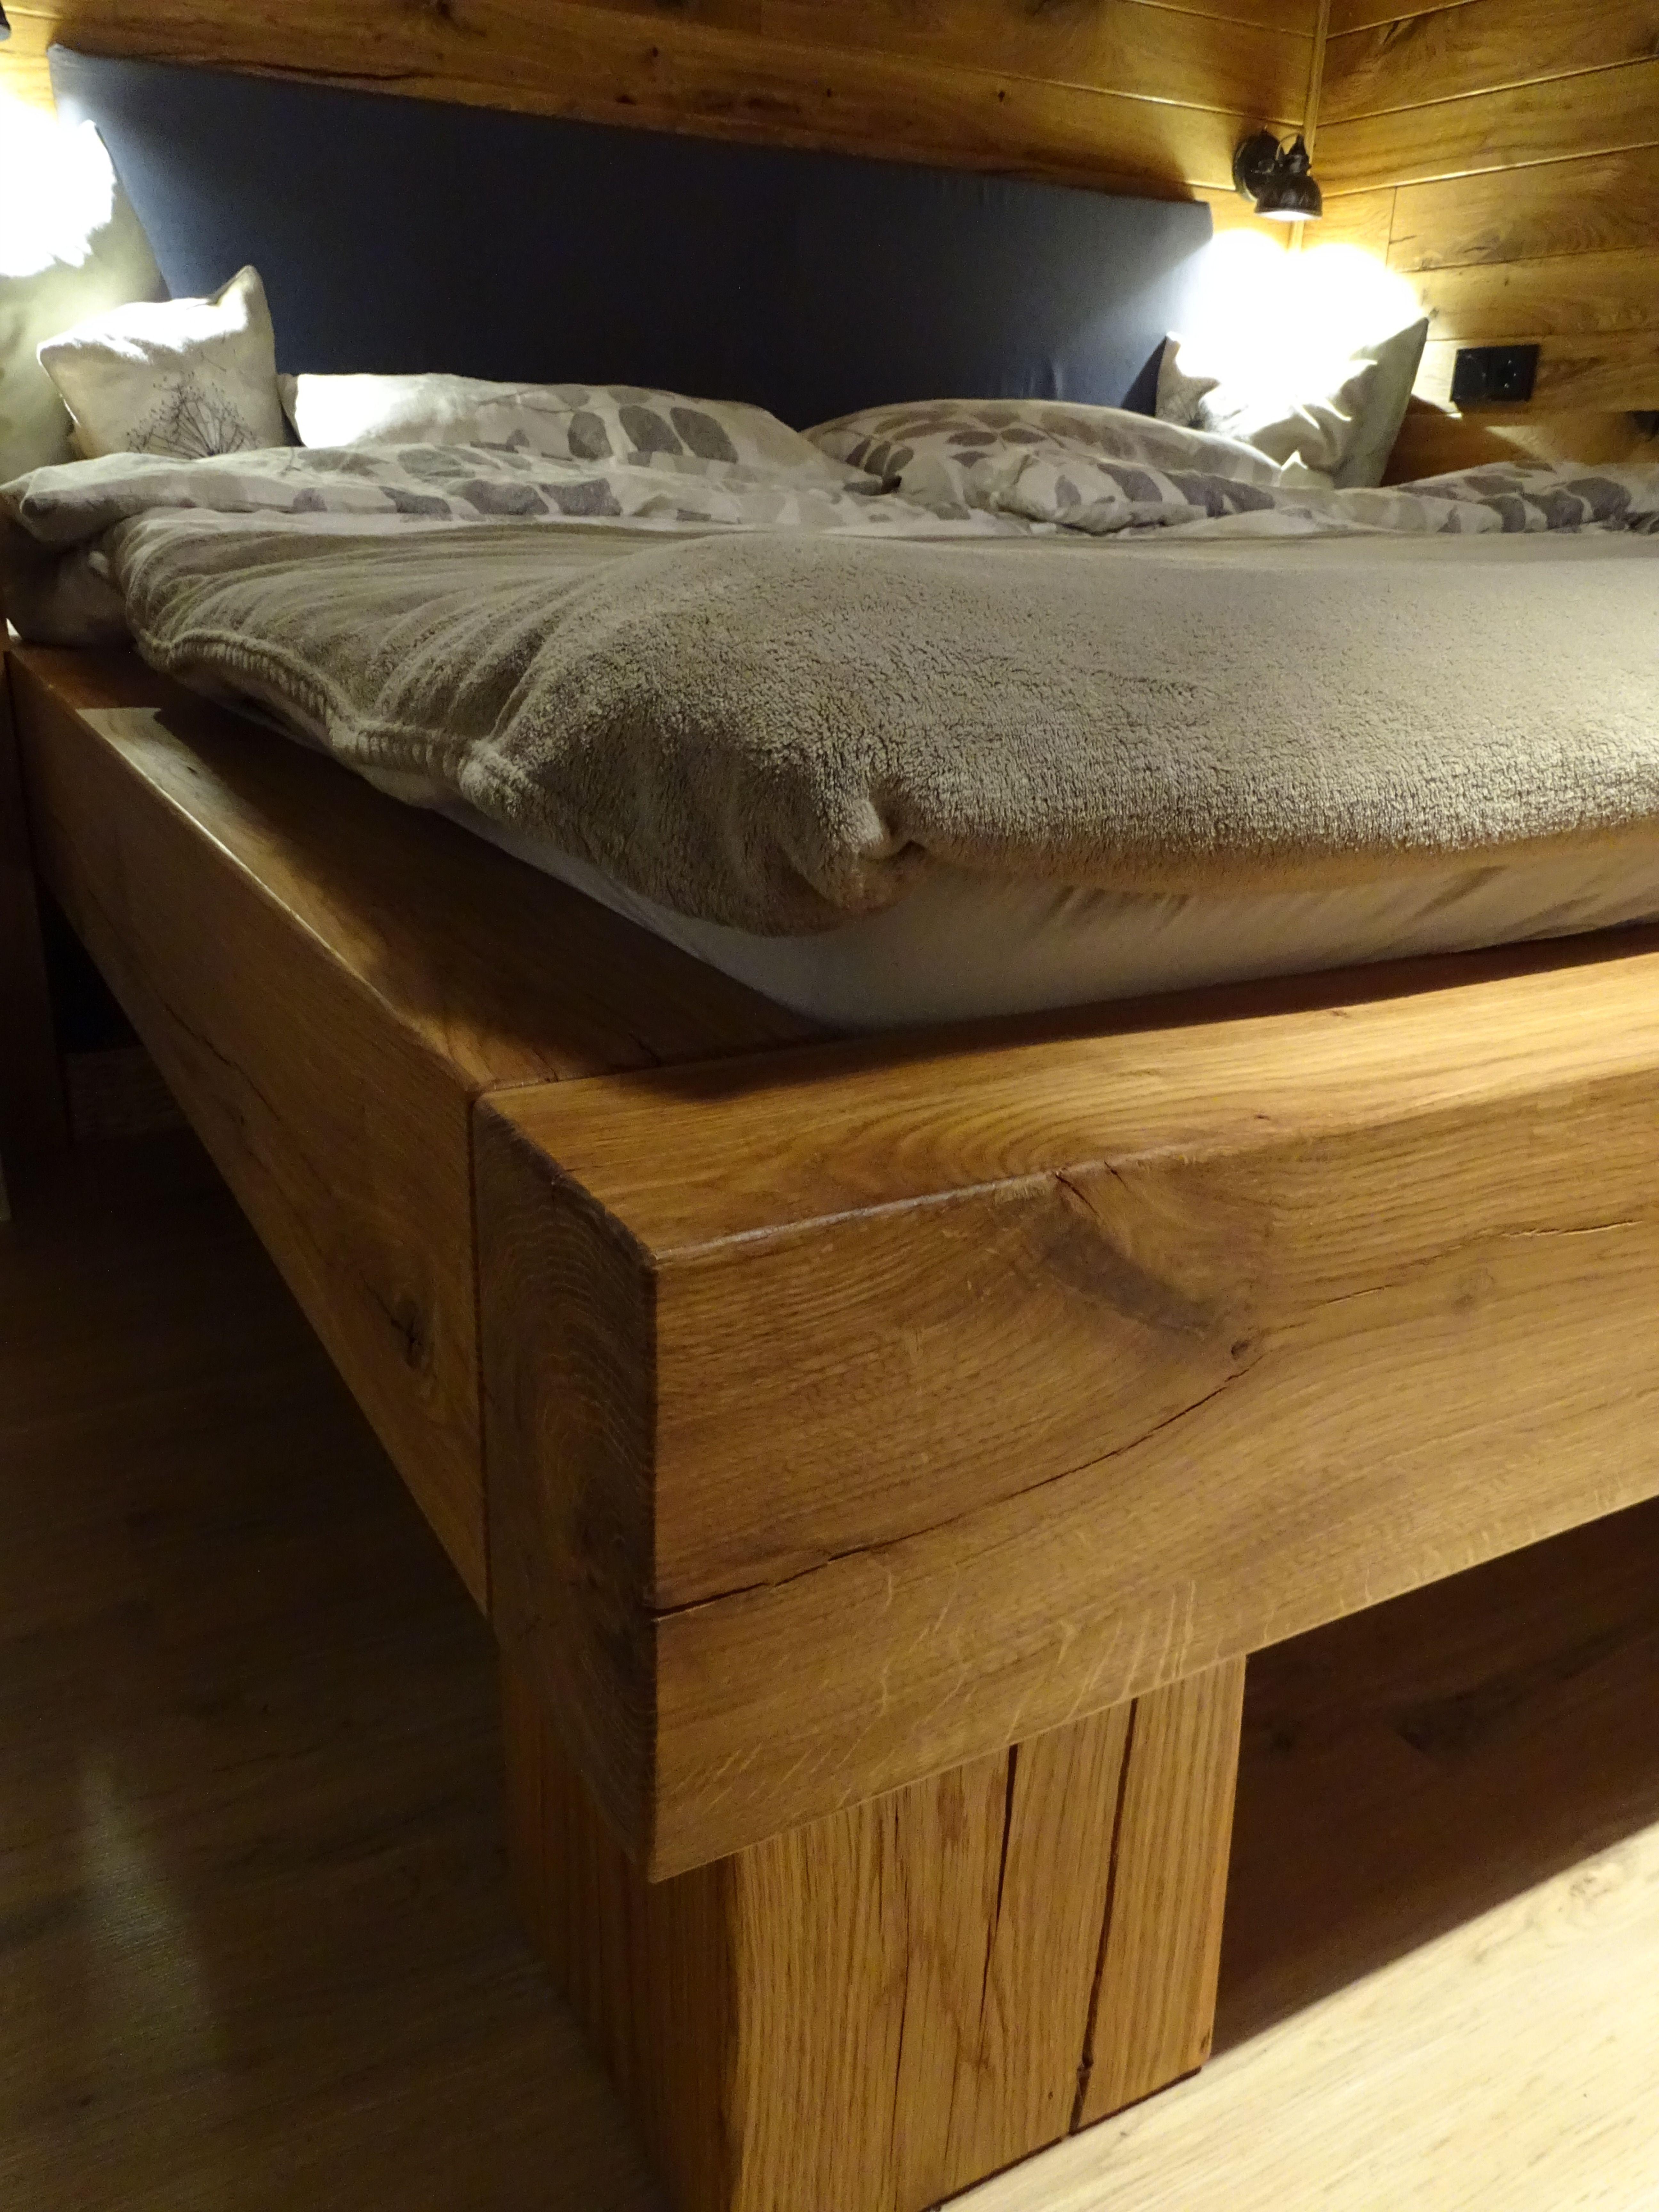 Pin Von Michael Schafer Auf Mobelideen Massiv Bett Bett